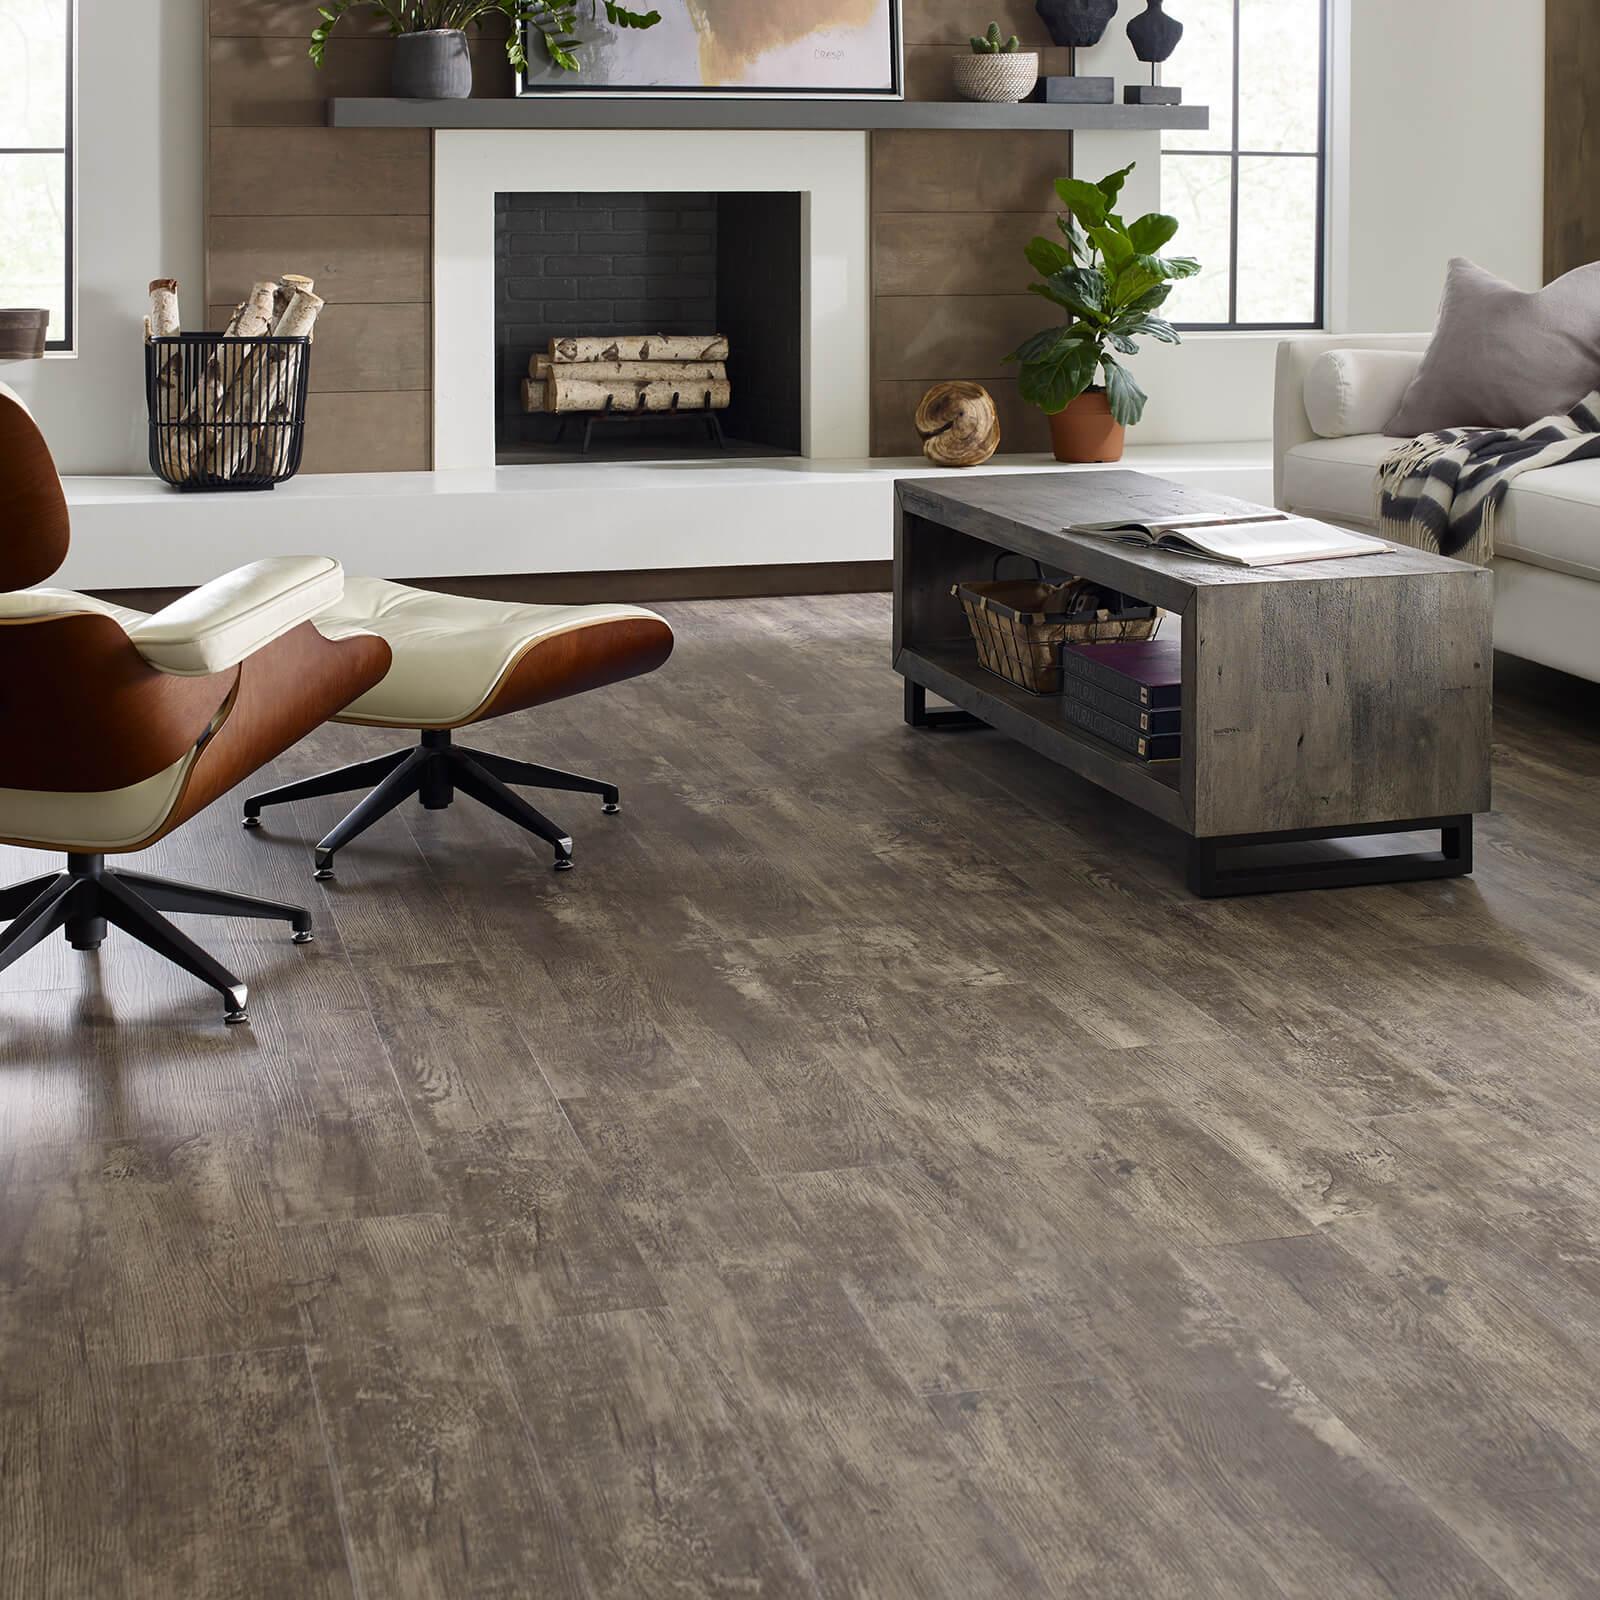 Paramount vinyl flooring | Dolphin Carpet & Tile